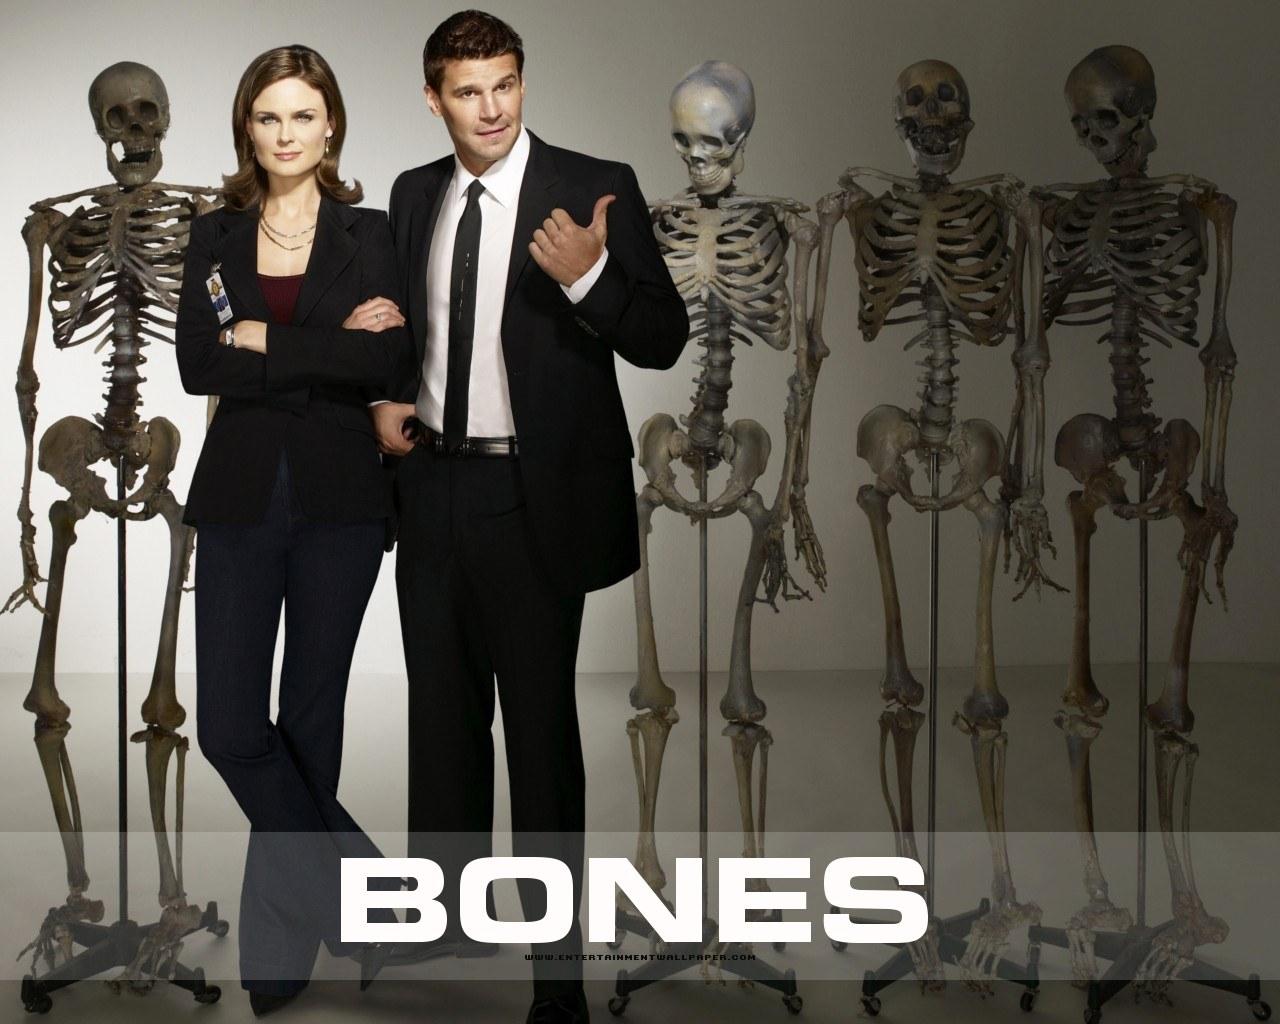 http://1.bp.blogspot.com/_JmFRhjkgg1o/TNYIUS5TQ3I/AAAAAAAAABs/hxMV_8ailZ8/s1600/bones-wallpaper-3.jpg